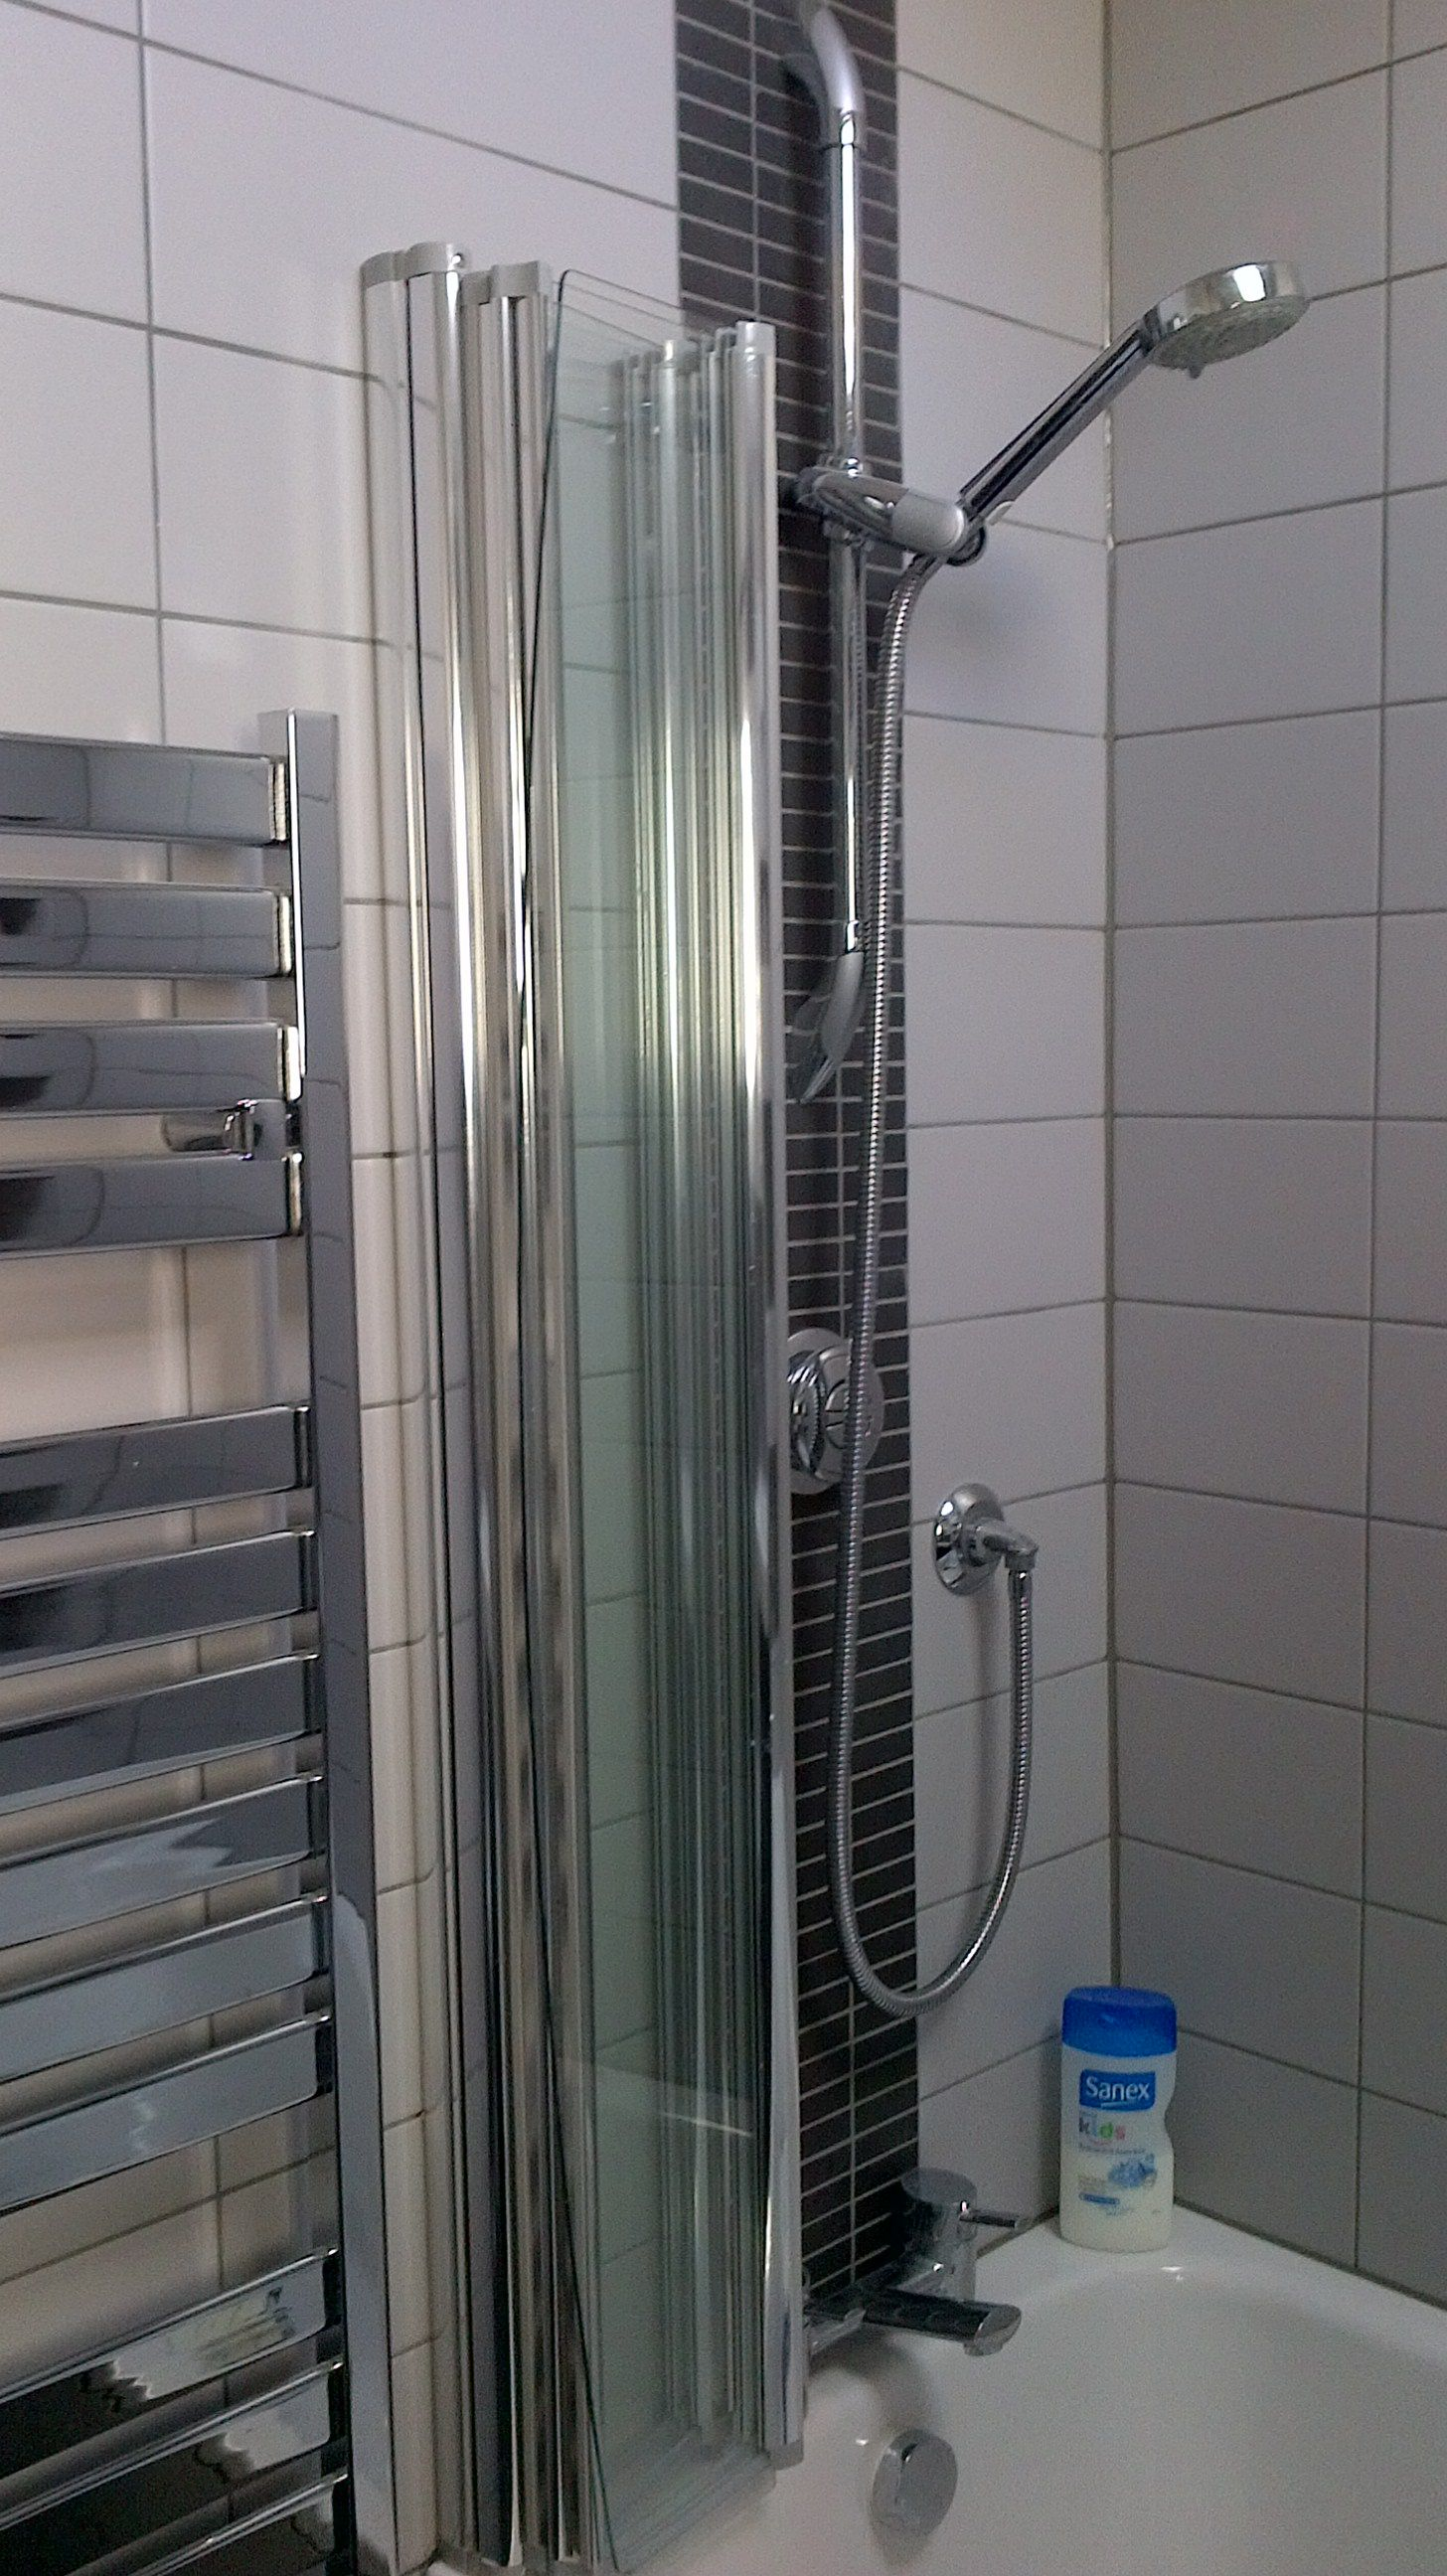 Croydon Road Beckenham Bathroom With Aqualisa Digital Shower